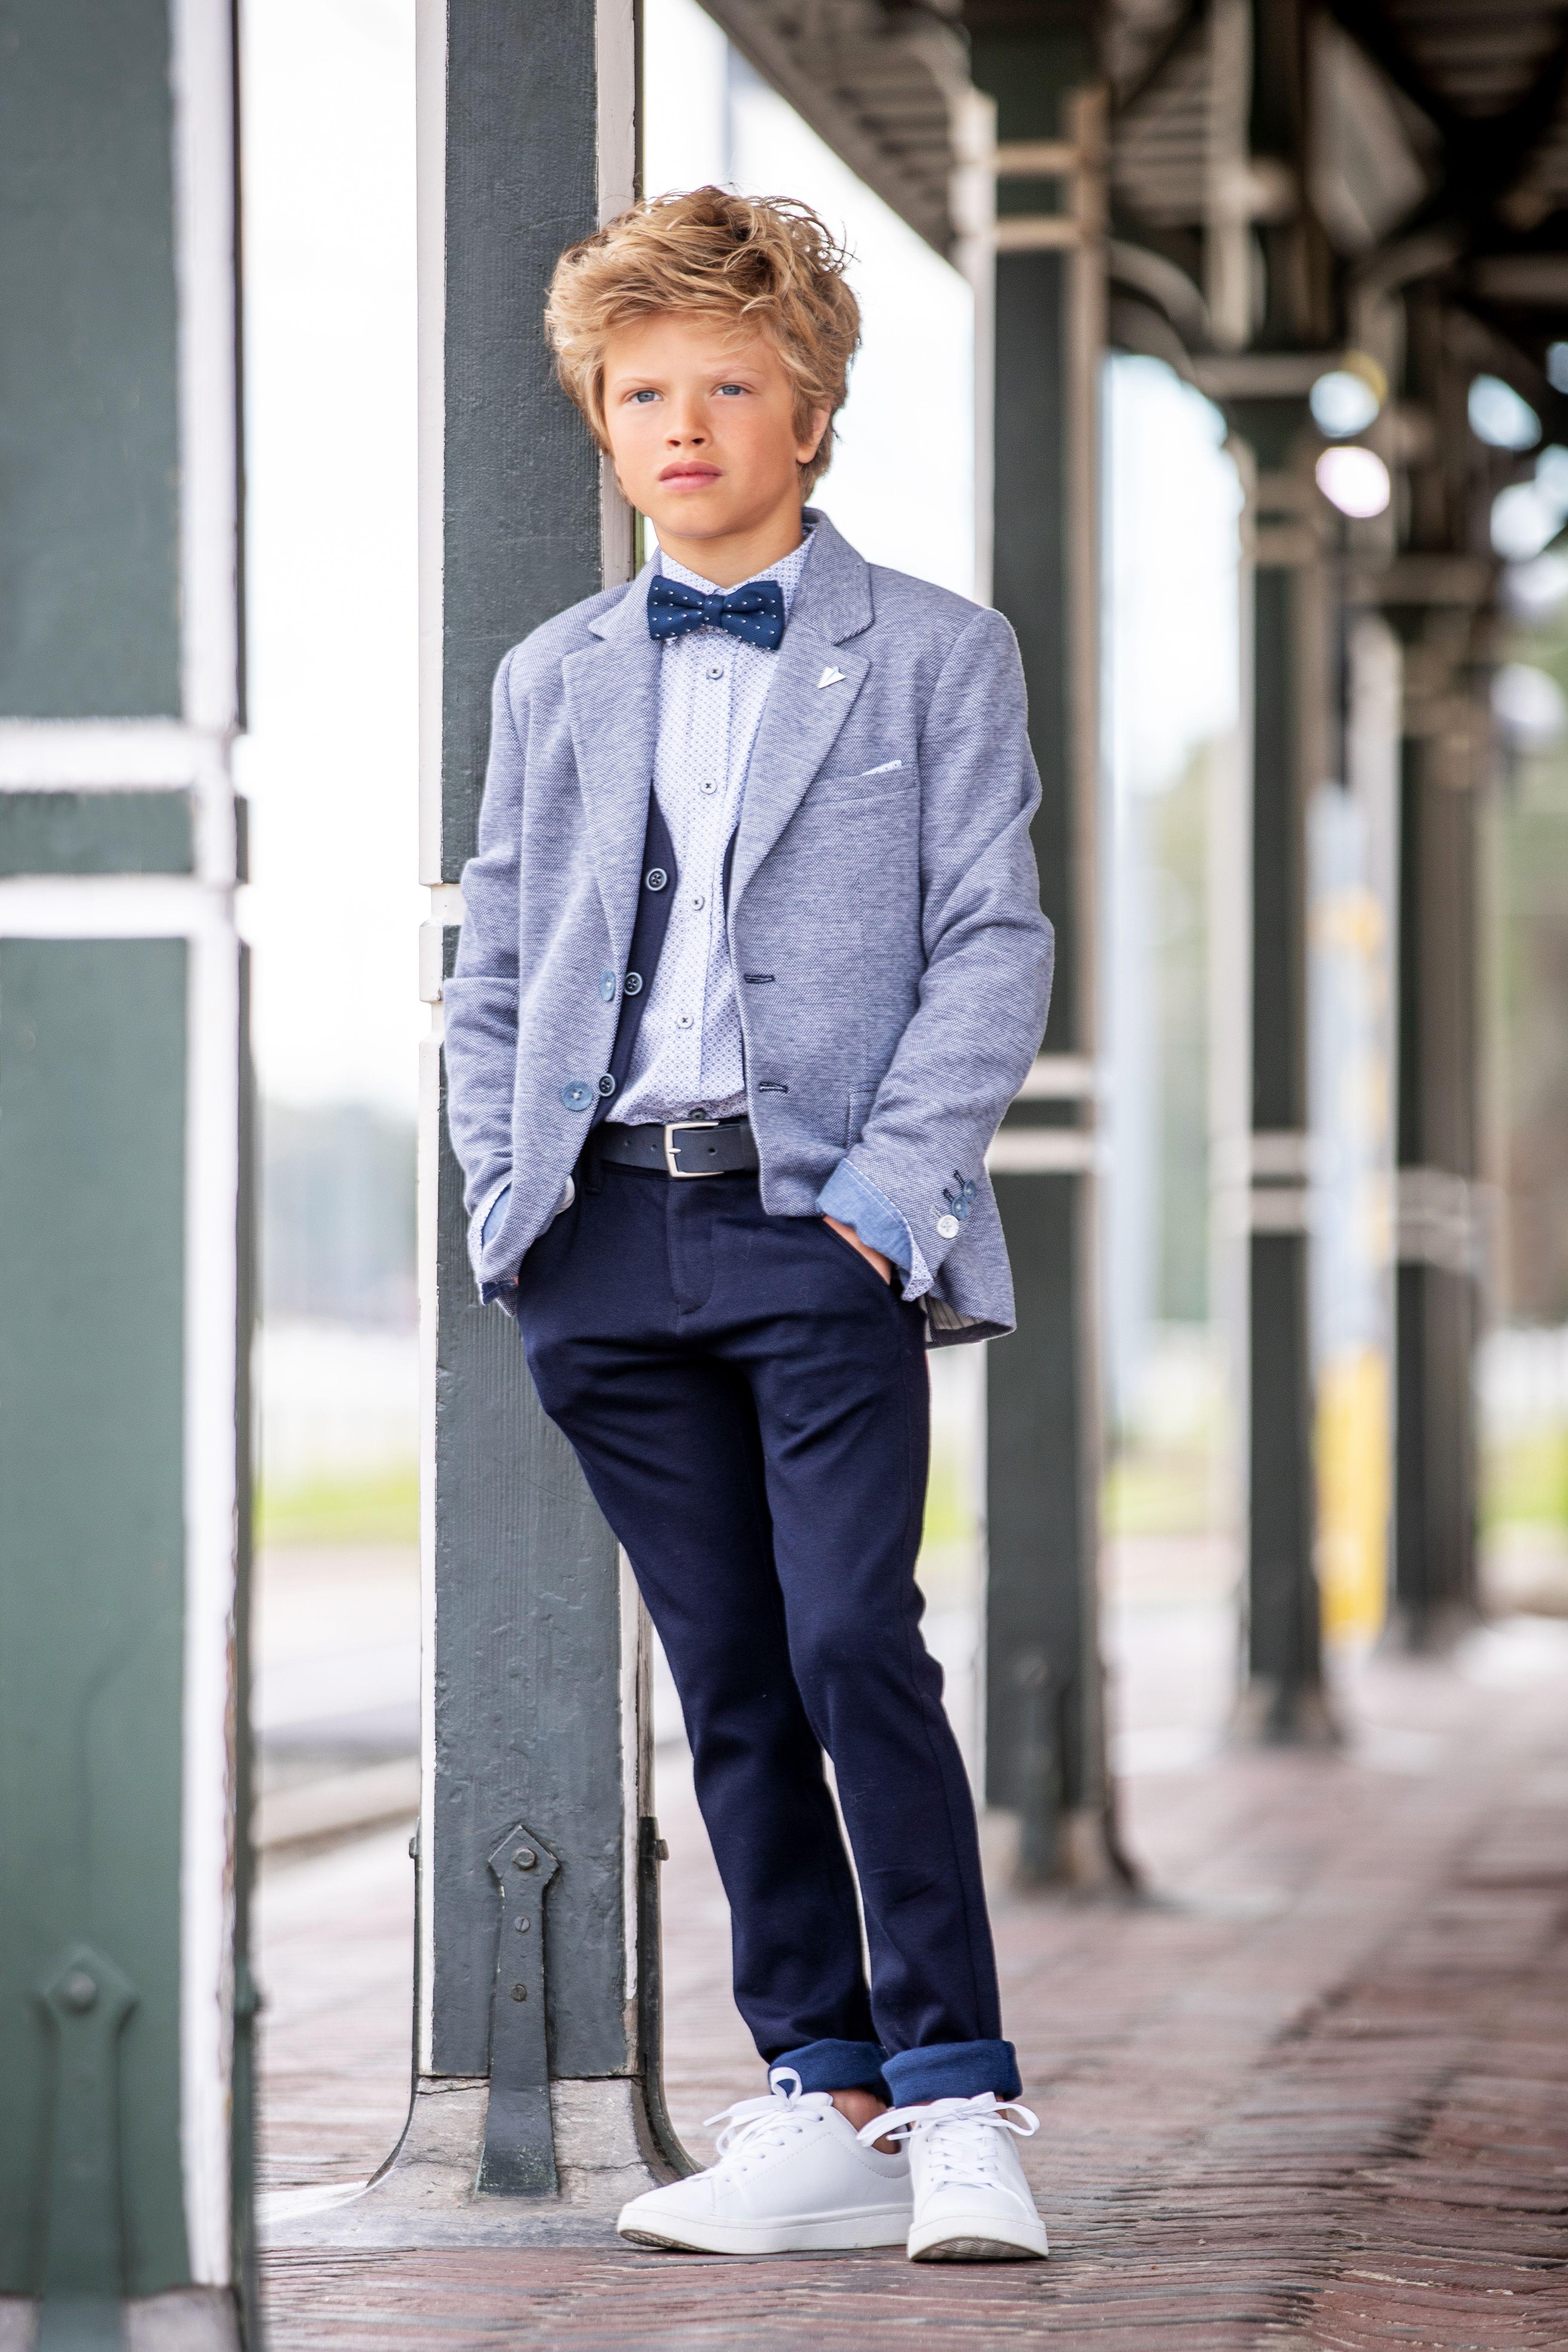 1b92c81e4c3 Communie collectie | dashing kids/kids fashion/kids photography | Tween boy  fashion, Boy outfits und Fashion